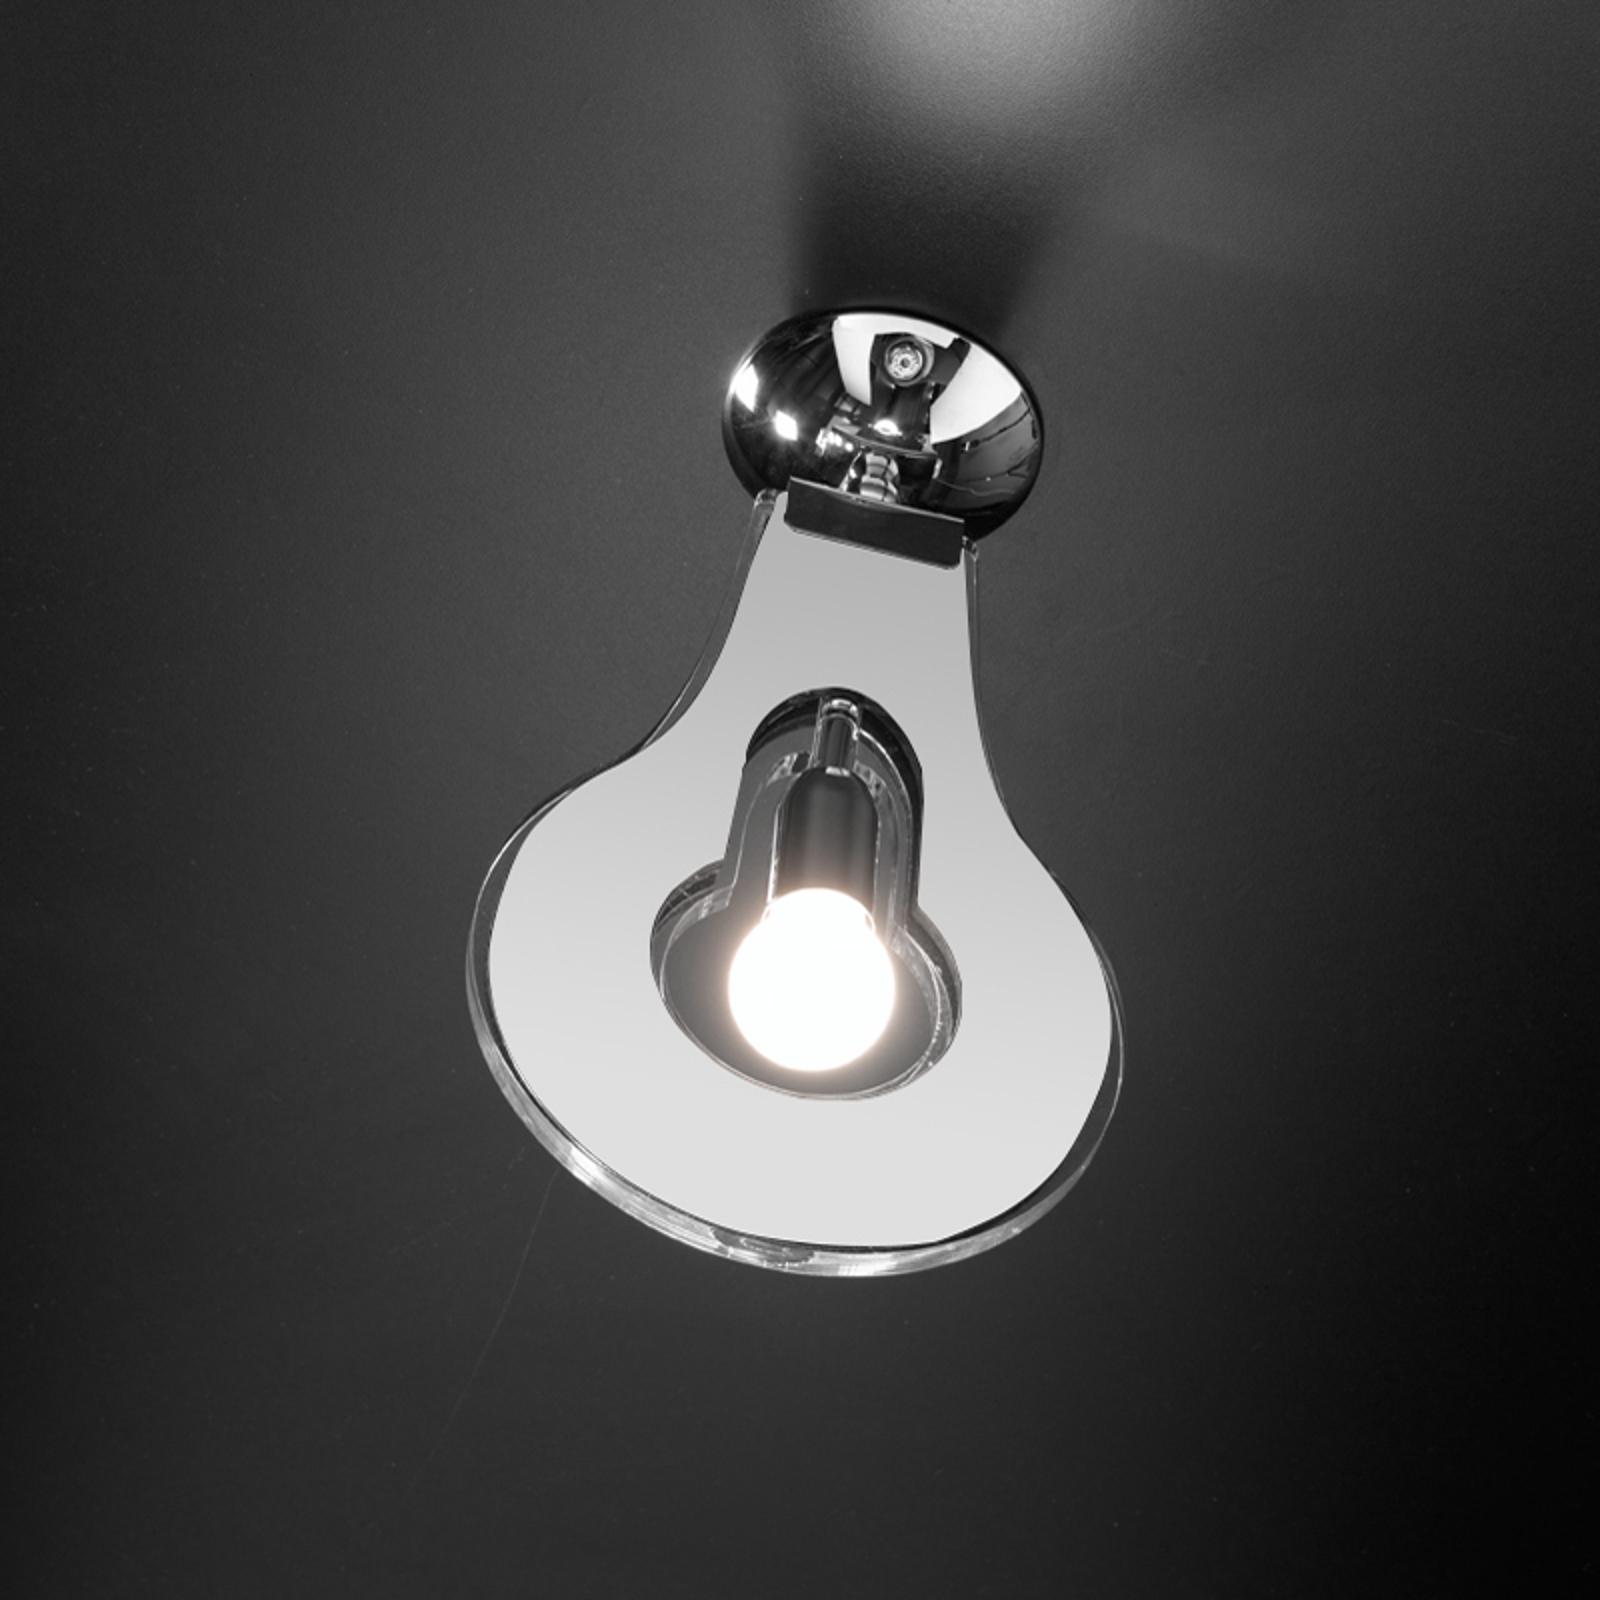 Modna lampa sufitowa Flat biała